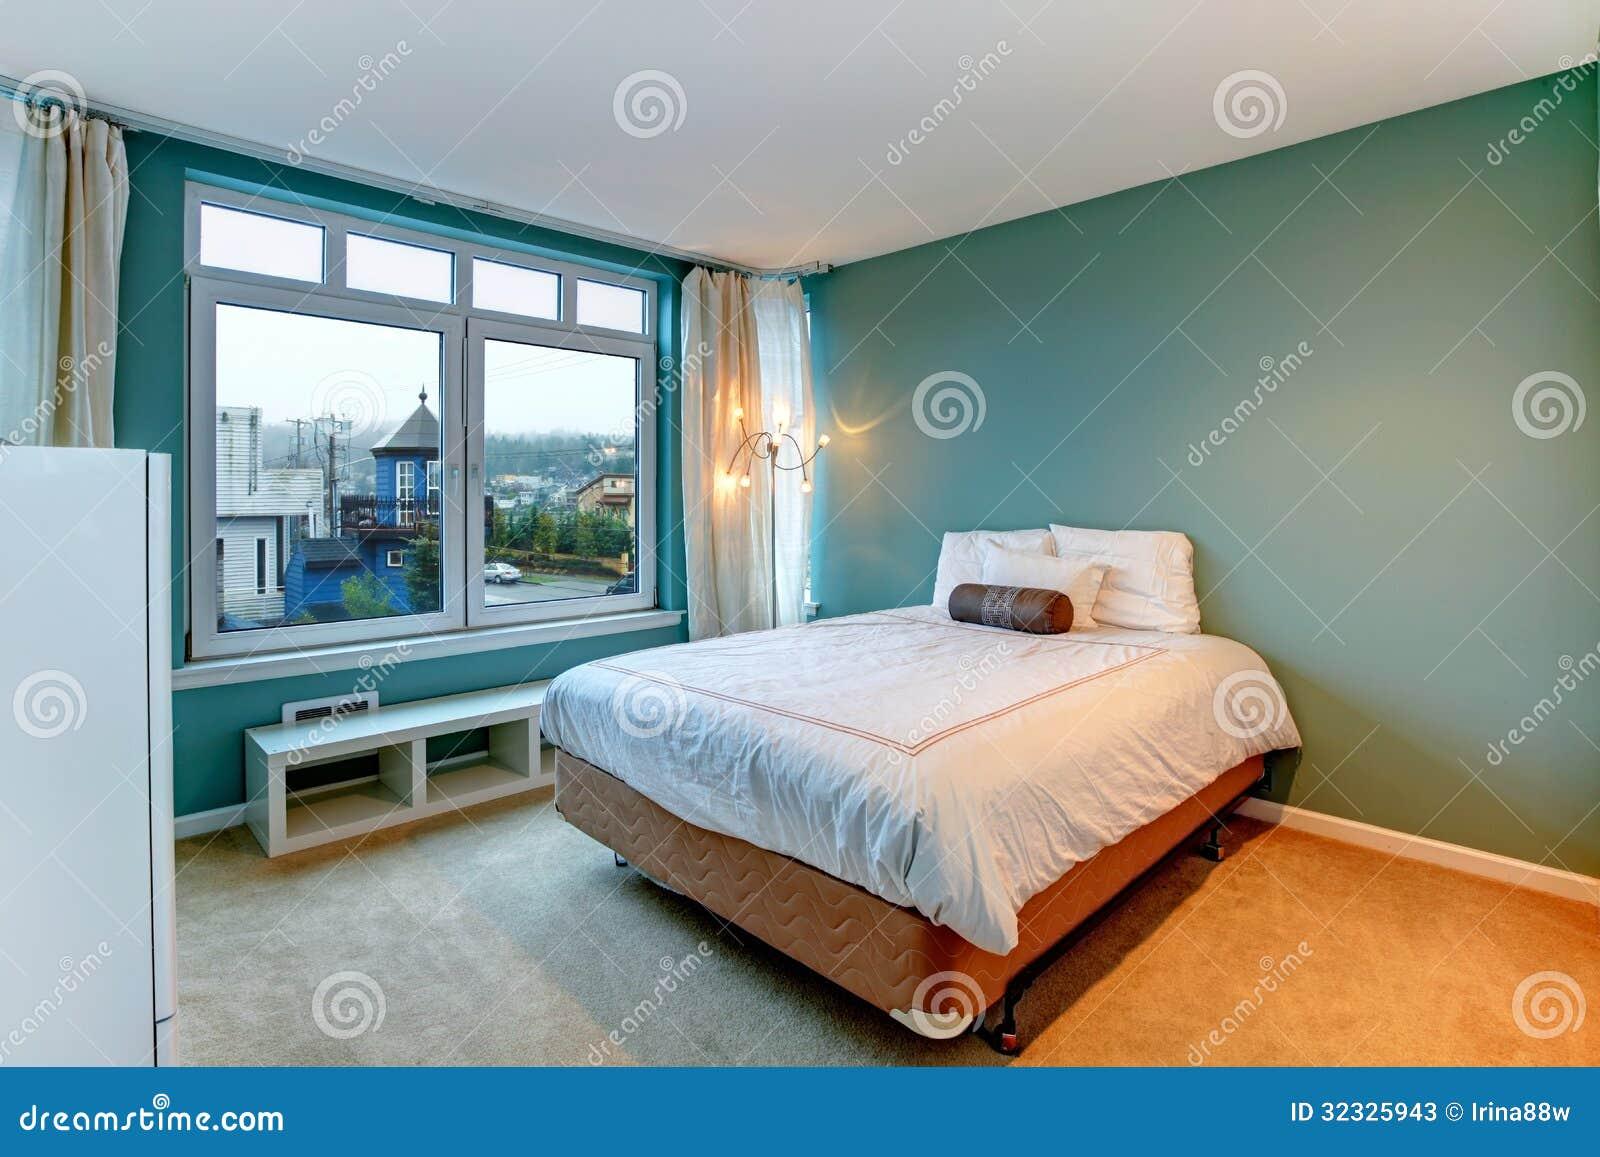 Slaapkamer Blauw Wit : Slaapkamer blauw wit piz zapp